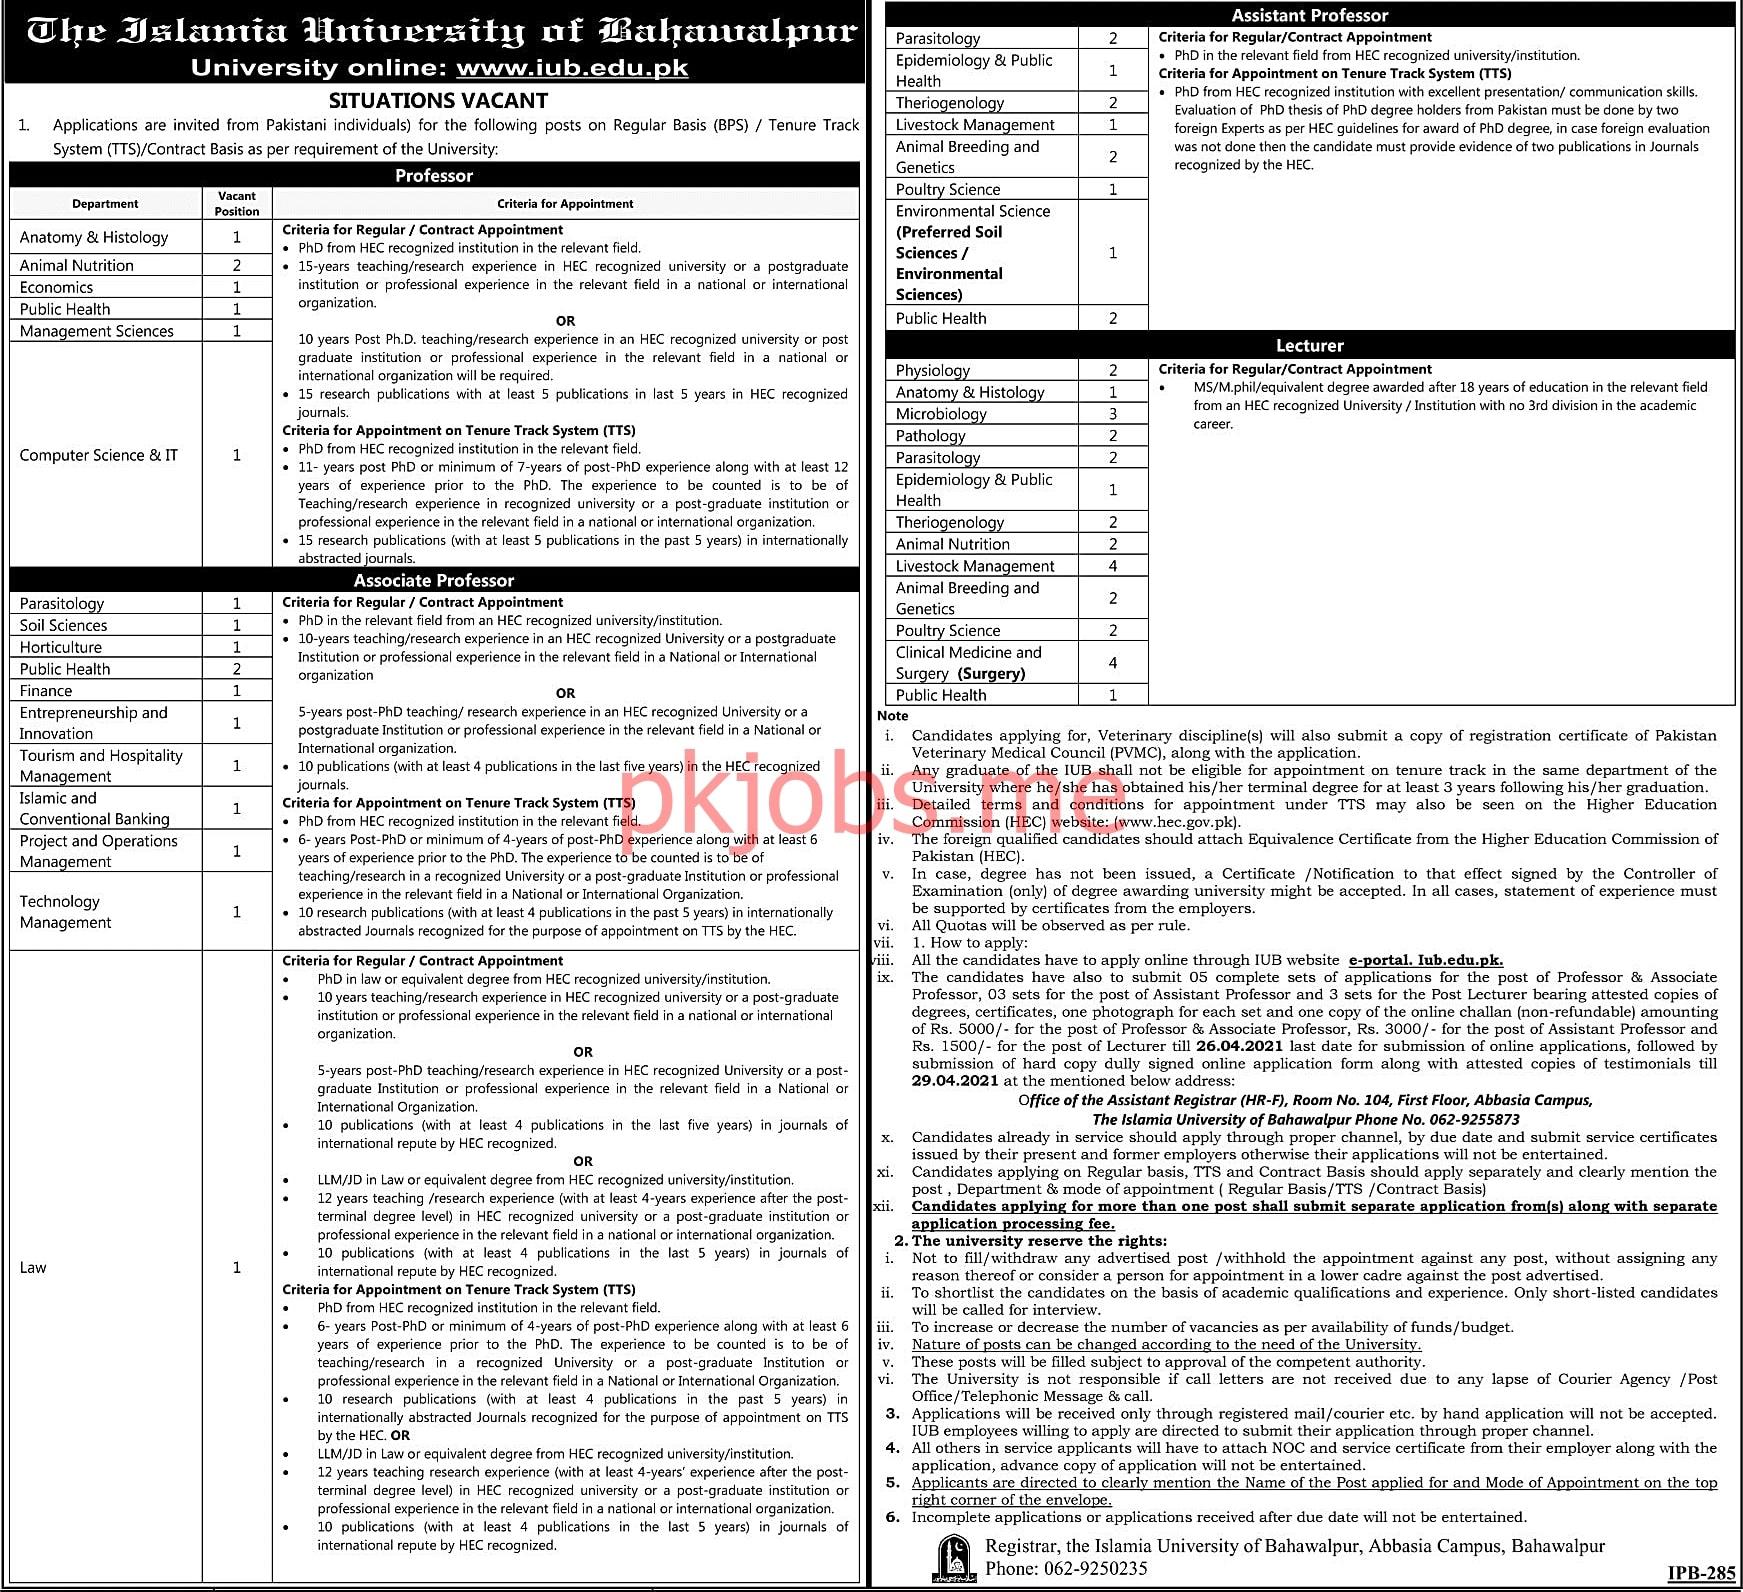 Latest The Islamia University of Bahawalpur Education Posts 2021